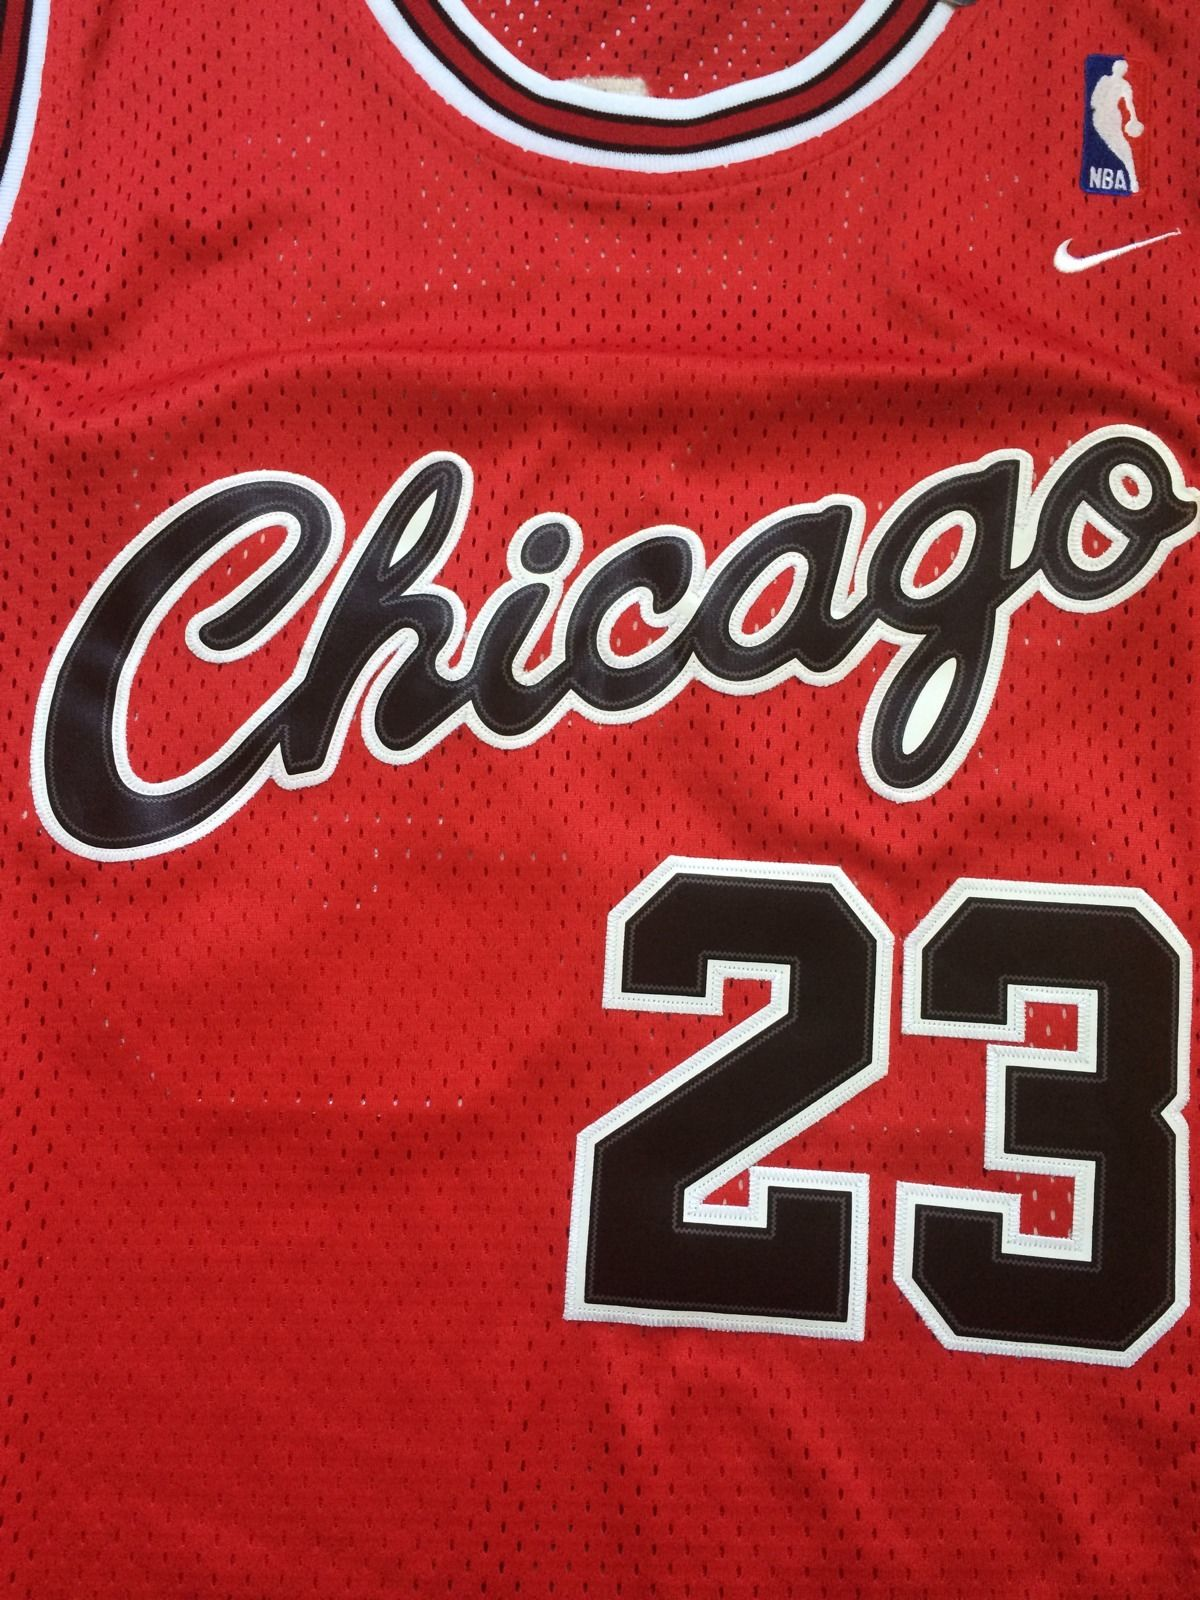 low priced 0c1c7 3f1b1 Vintage Gear: Nike Michael Jordan Bulls Rookie Jersey - Air ...